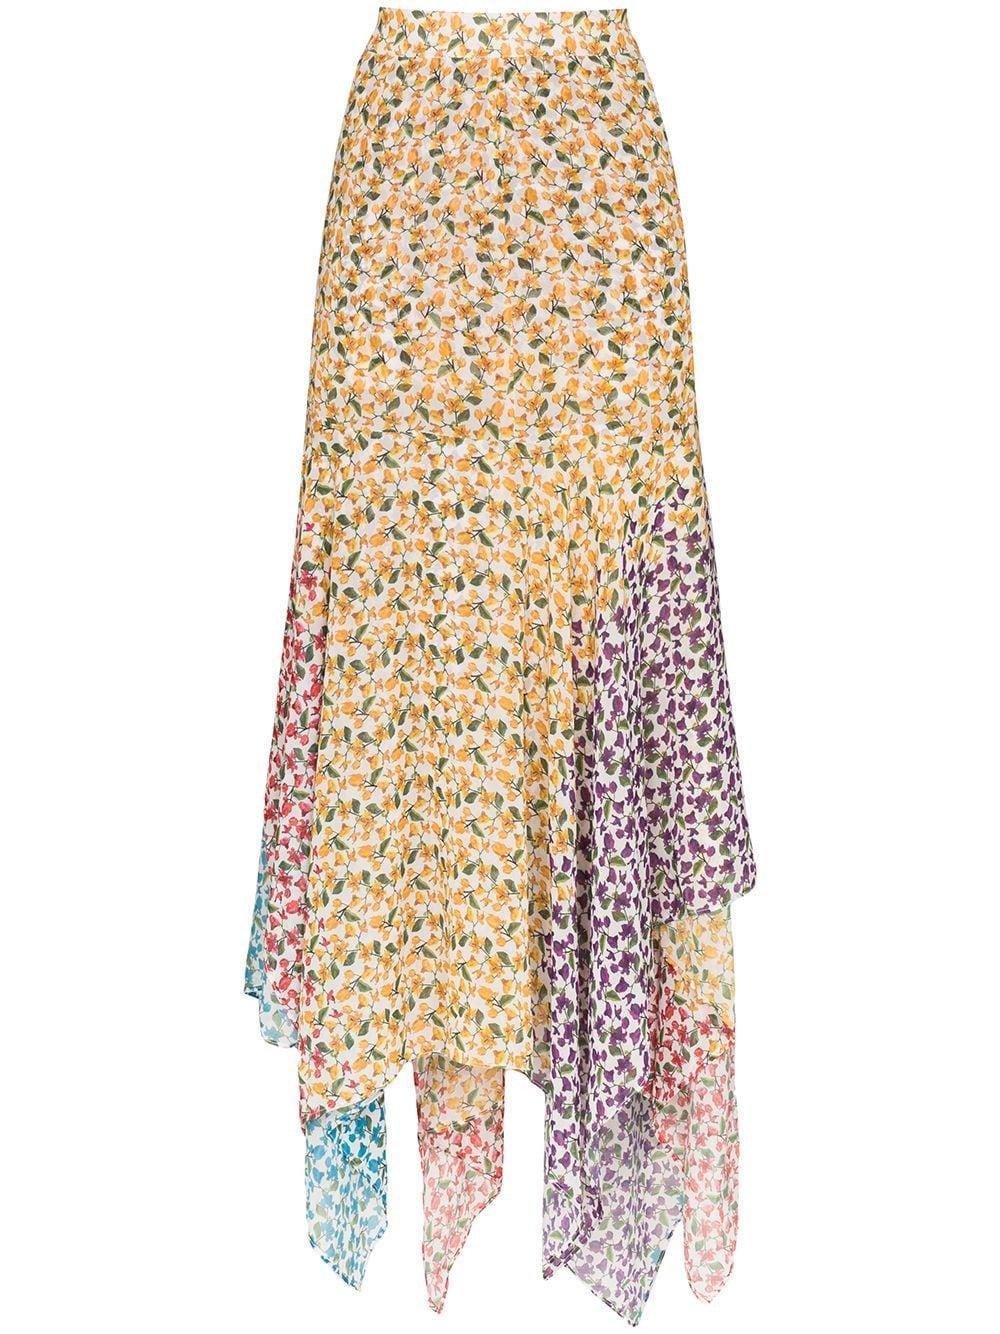 All Things Mochi Elisa asymmetric floral print skirt